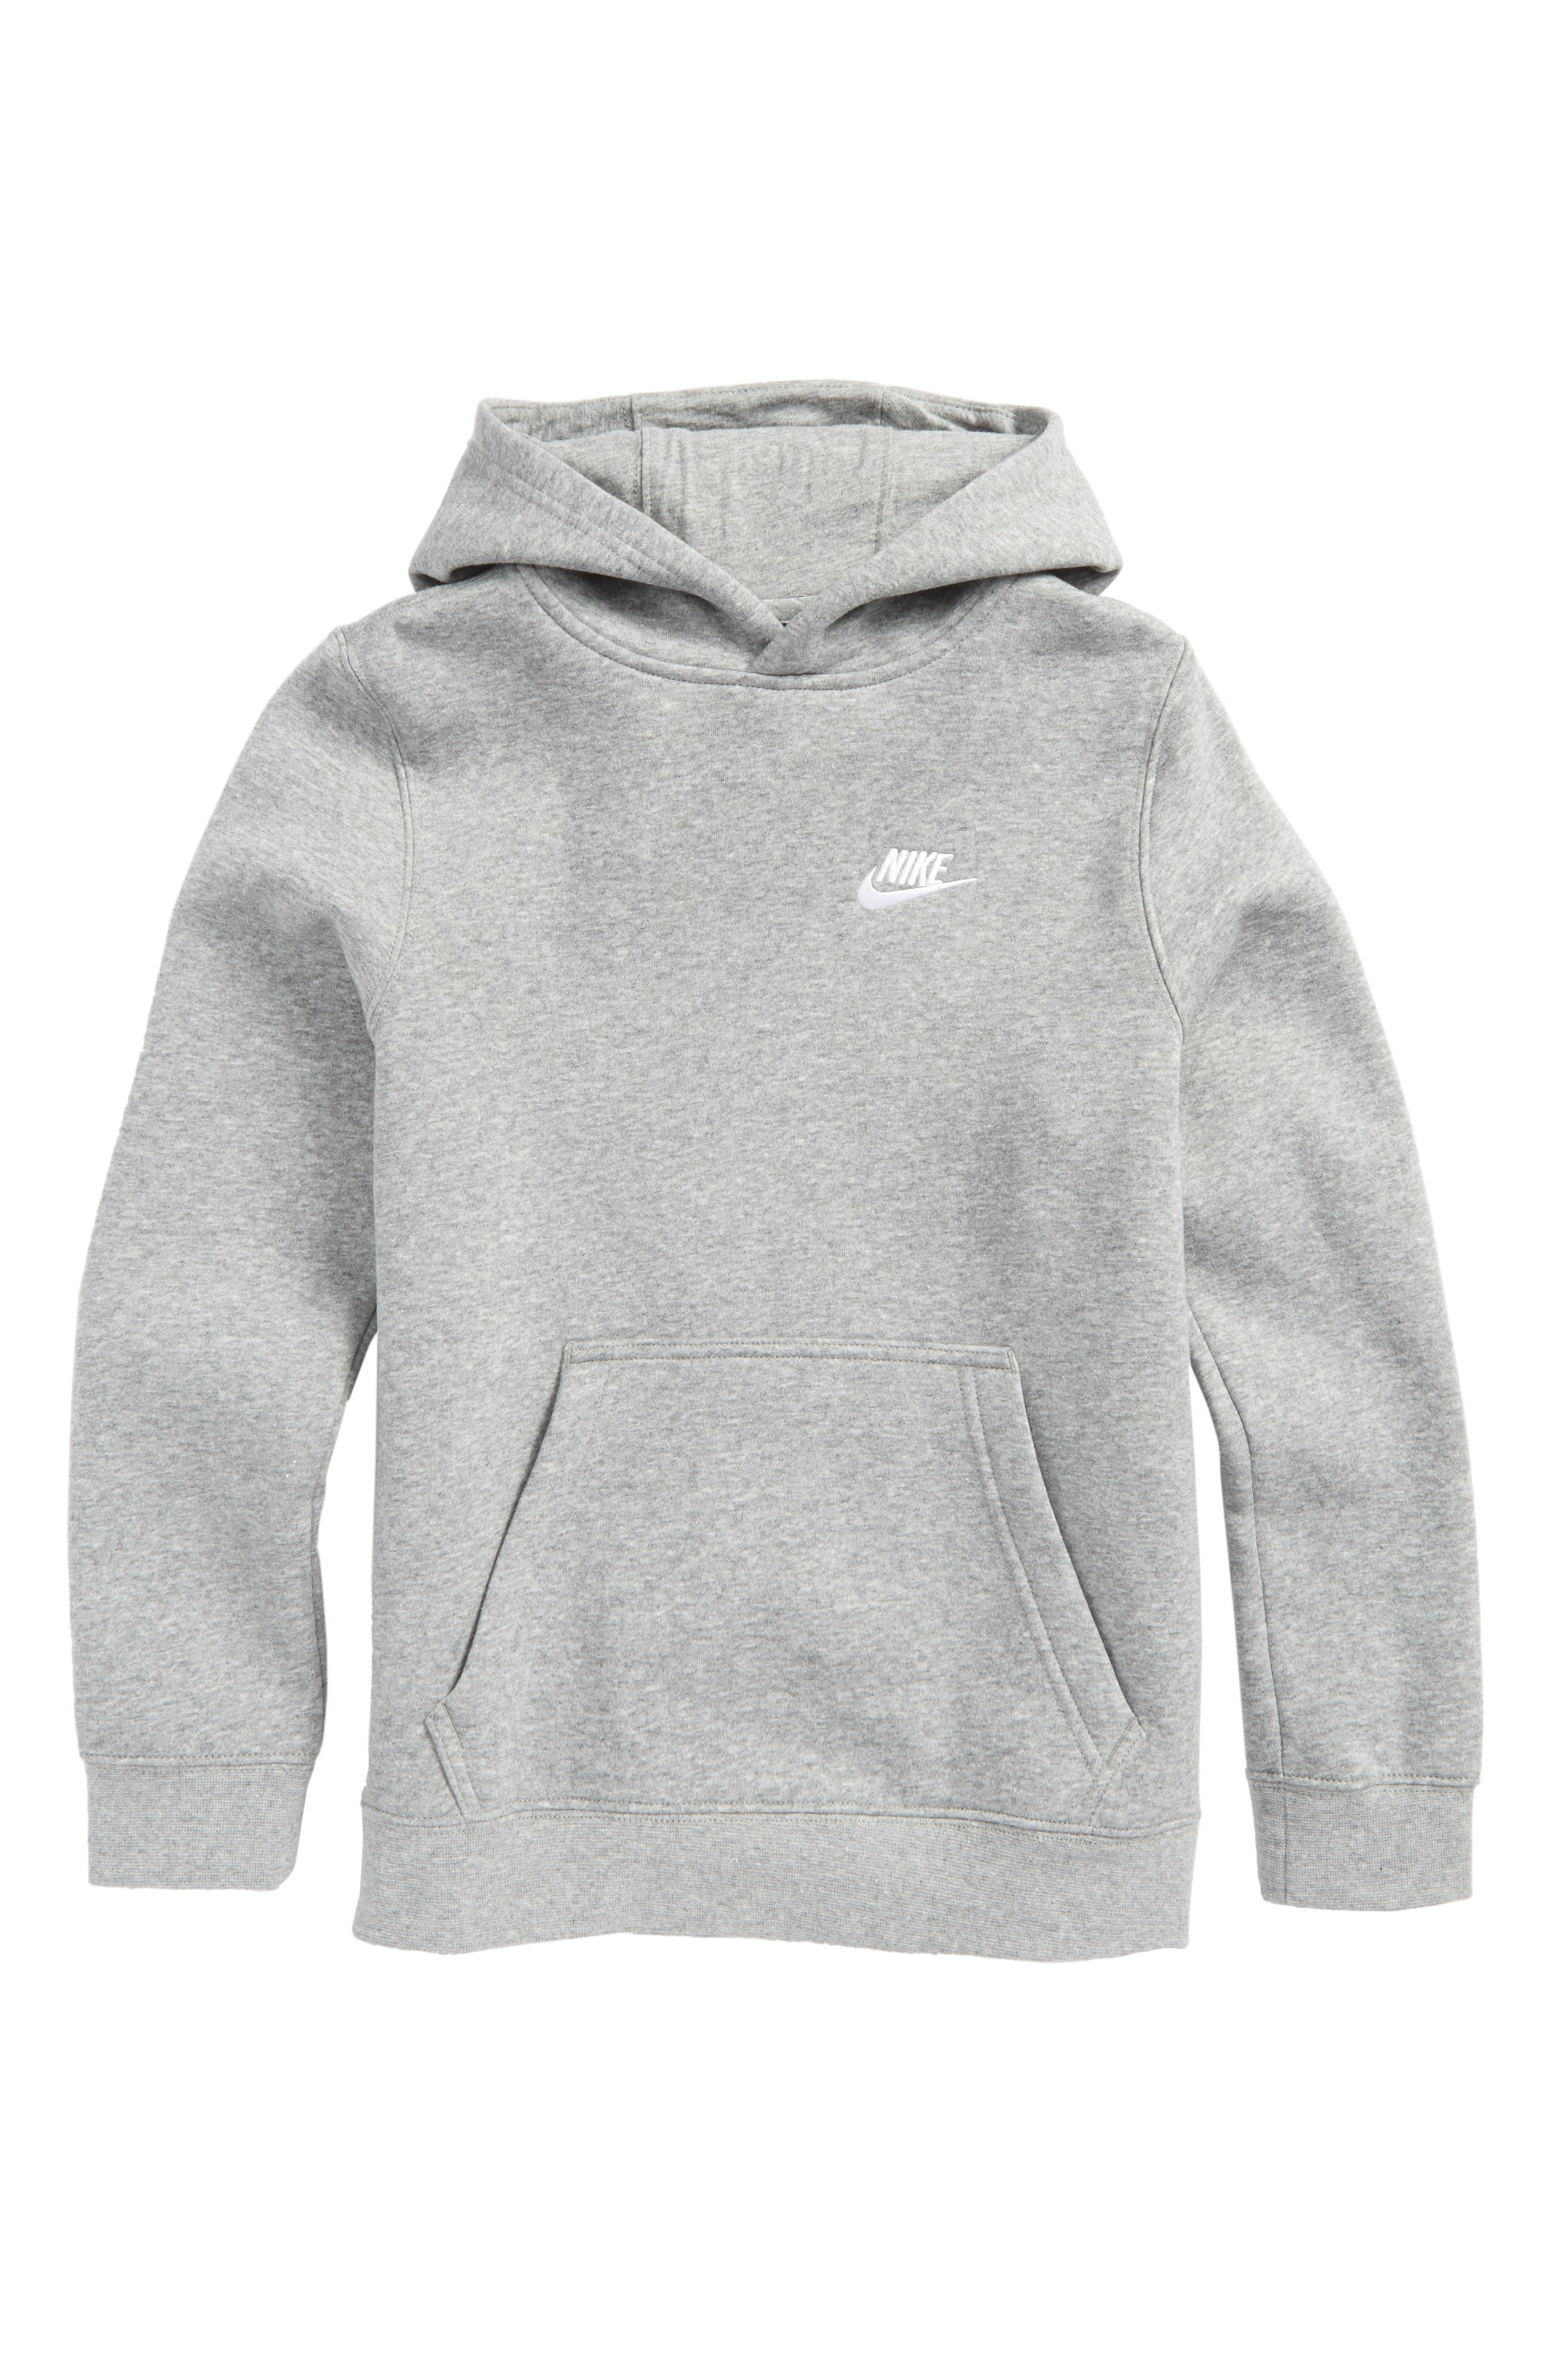 Sportswear Hoodie,                         Main,                         color, Dark Grey Heather/ White